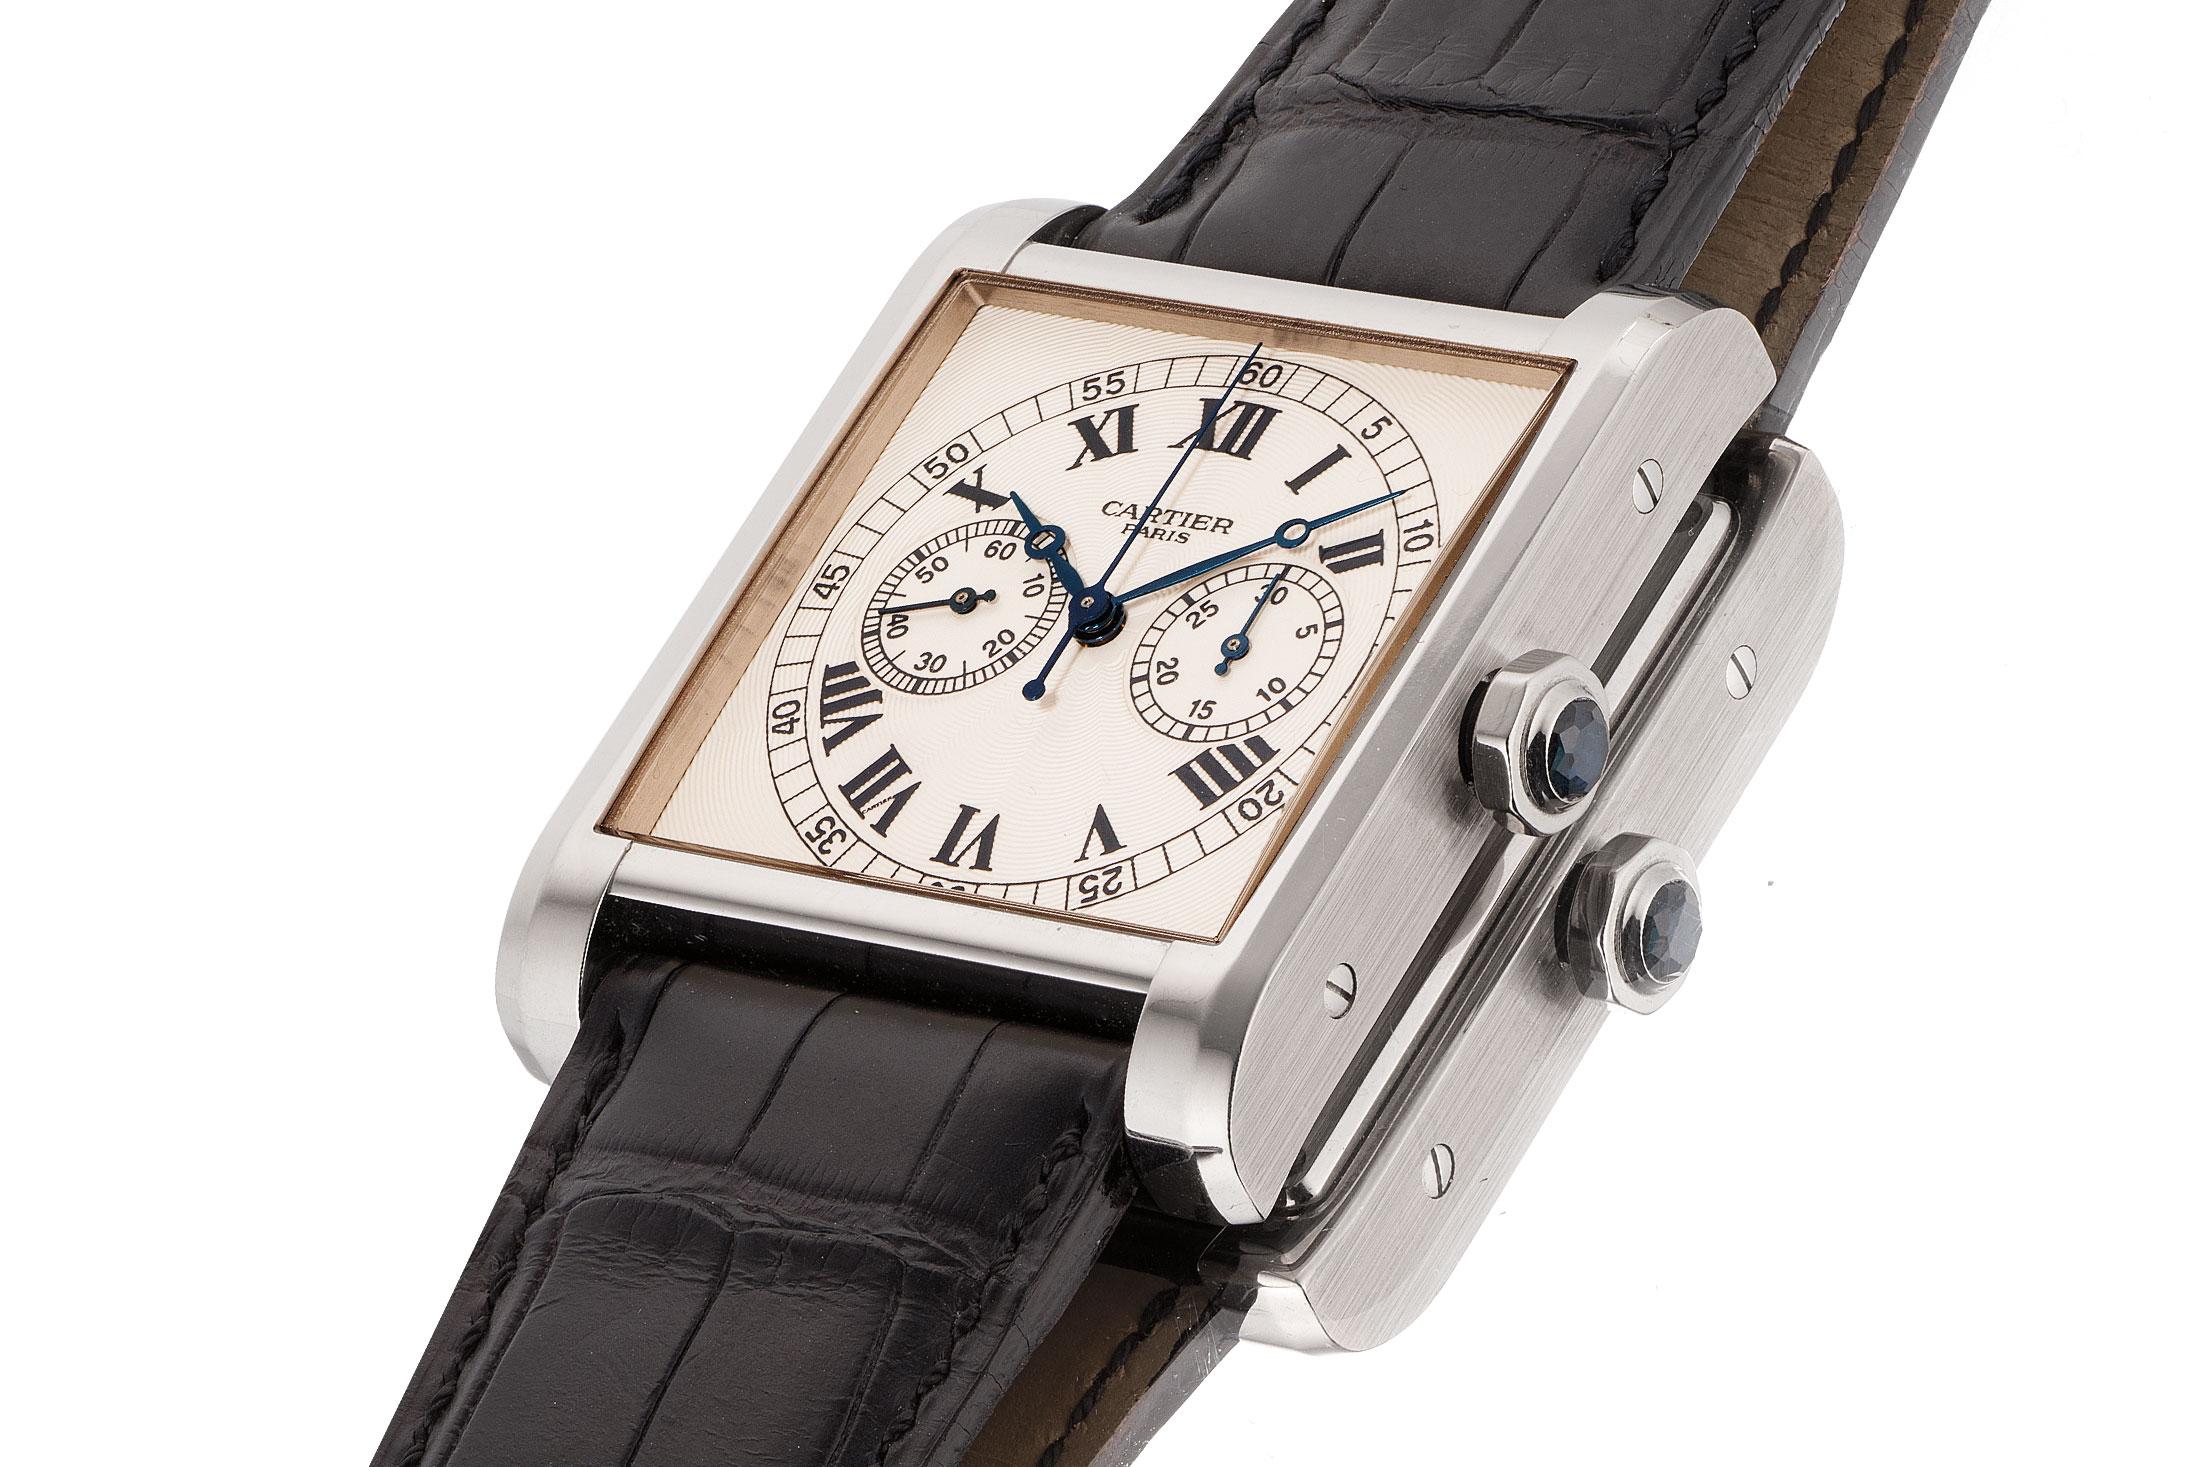 Cartier Monopusher Chronograph (Lot 60)